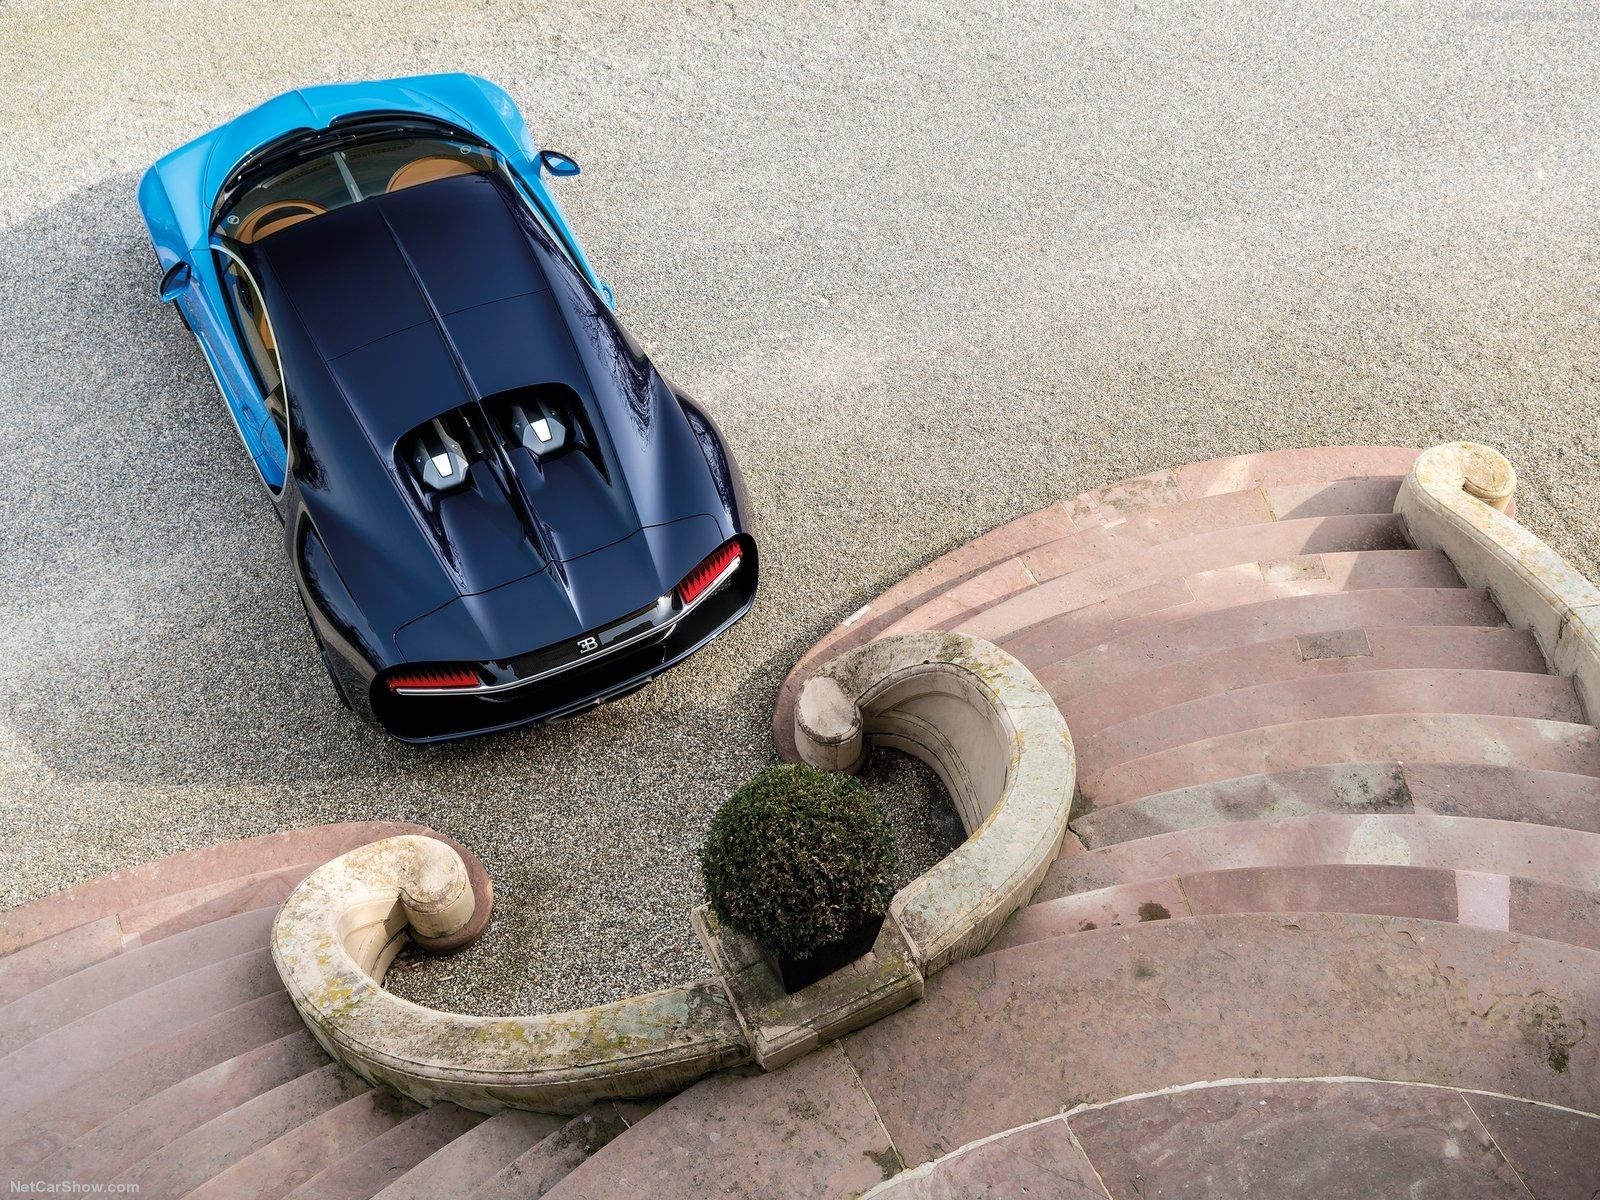 Bugatti-Chiron_2017_1600x1200_wallpaper_1d